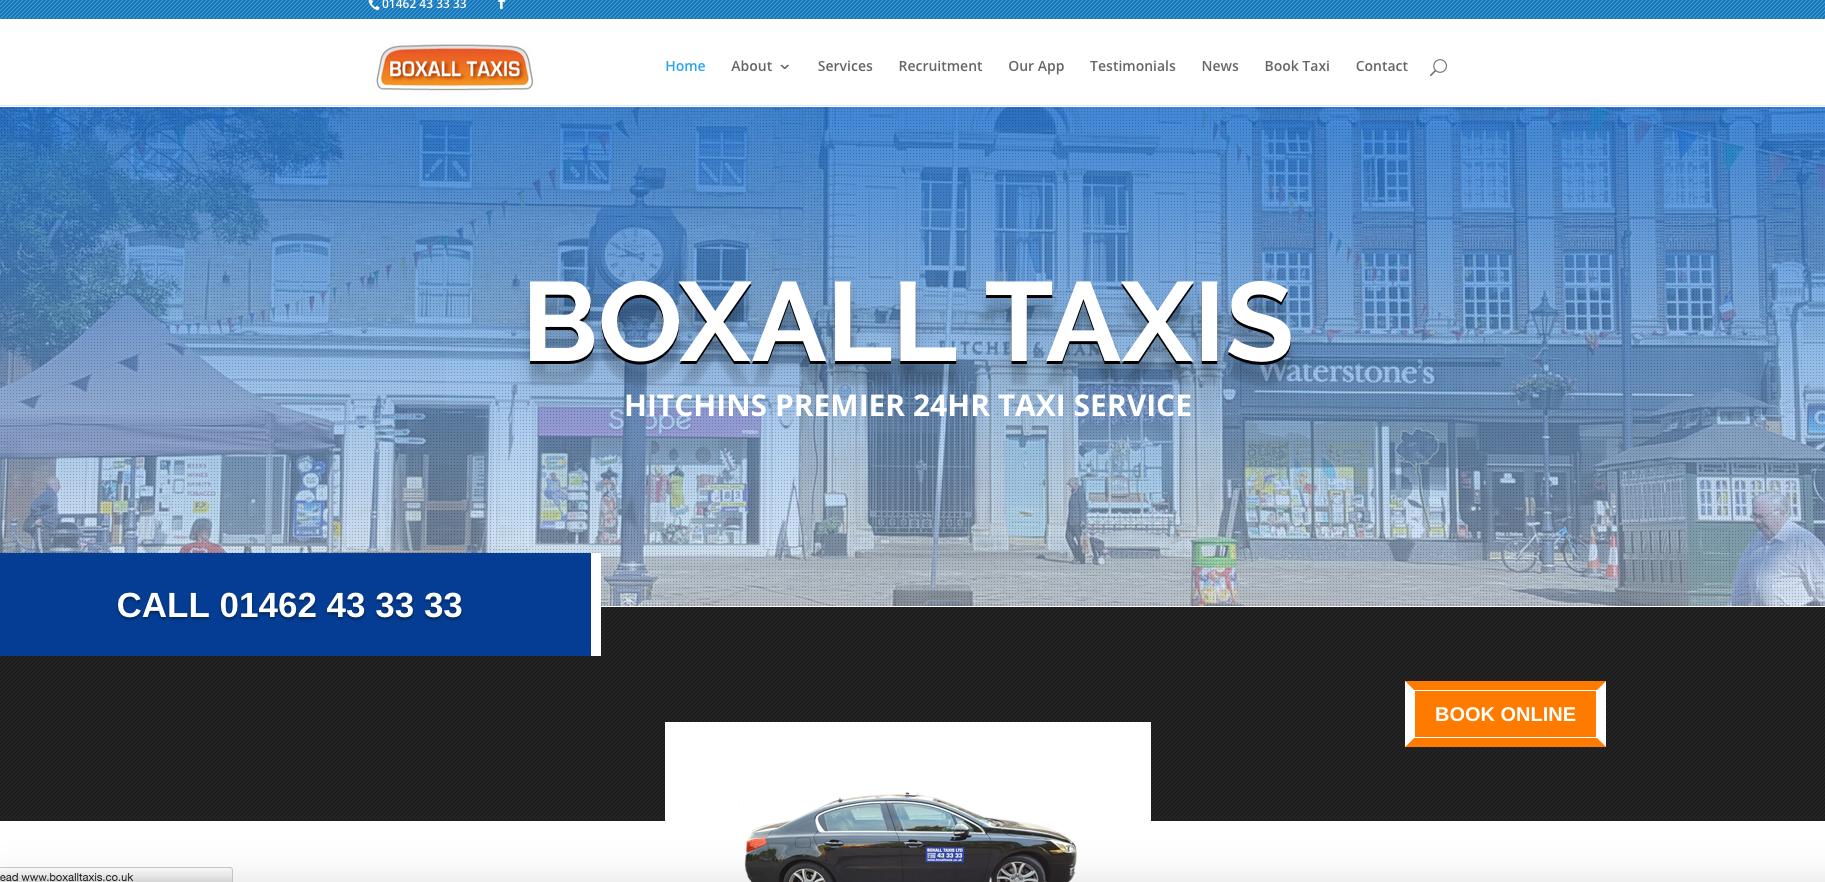 Boxall taxis